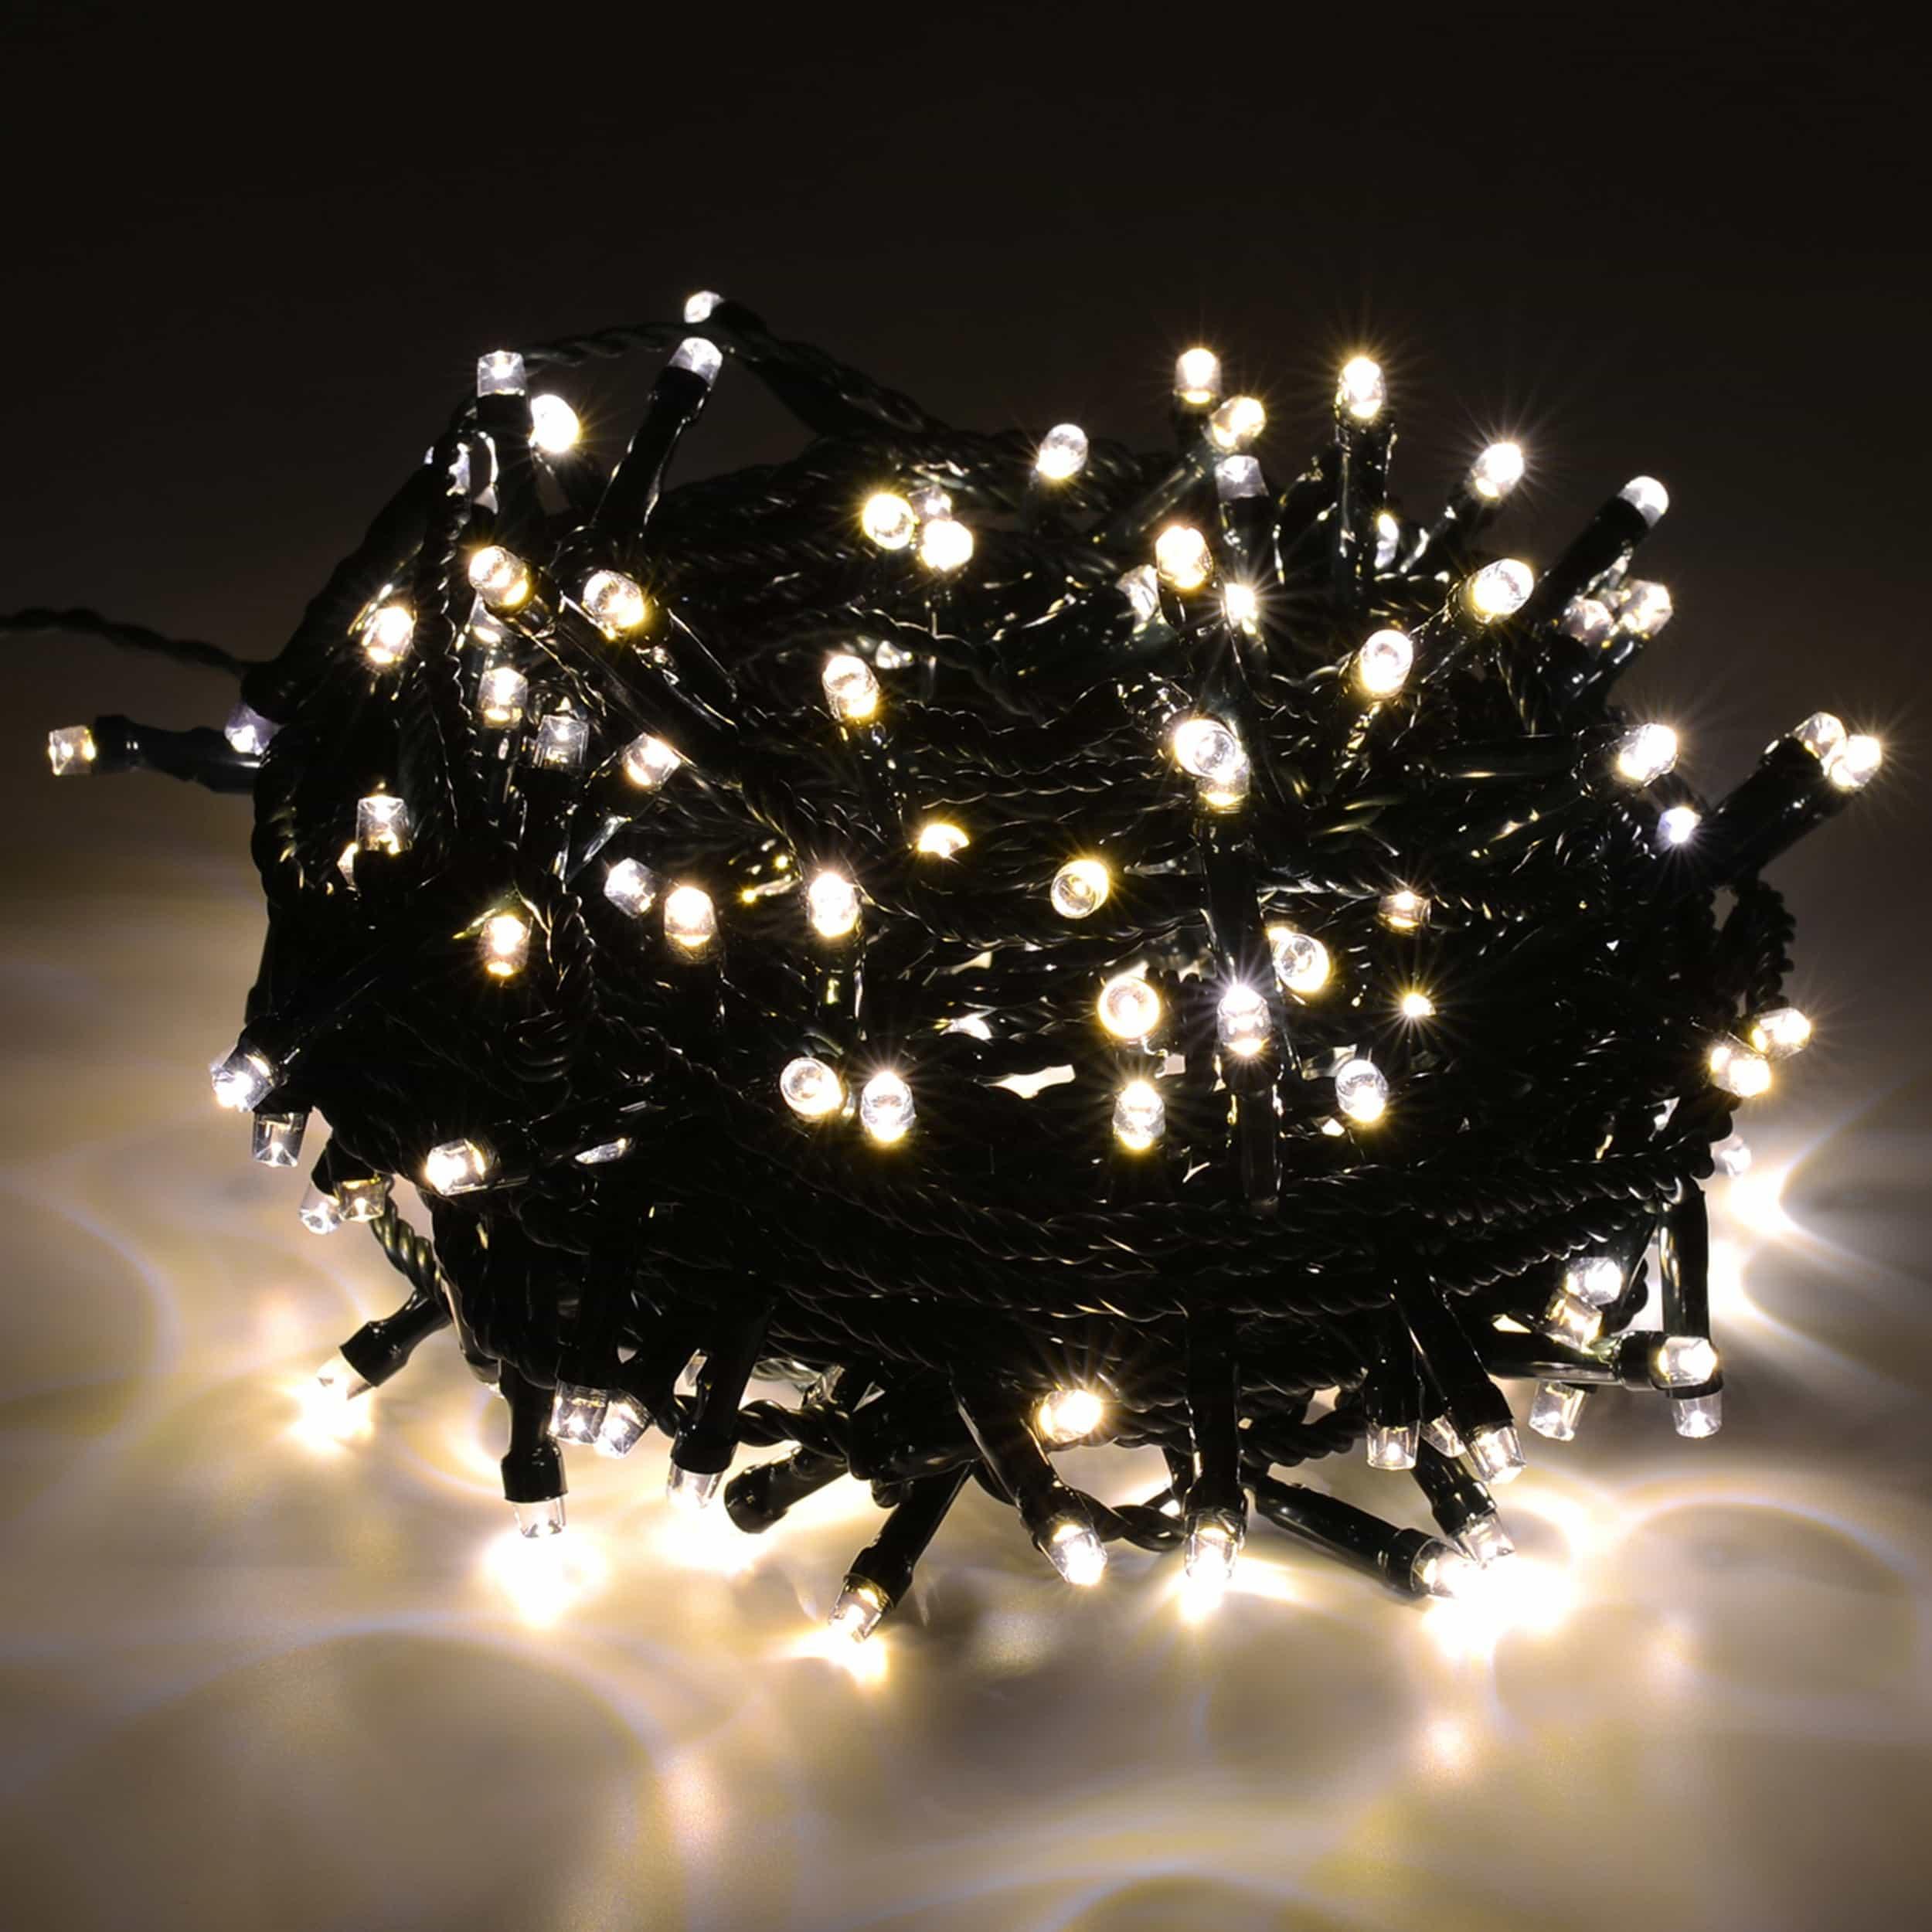 LED Lichterkette 600 LED energiesparend L30m LED-Lichtfarbe: kaltweiß